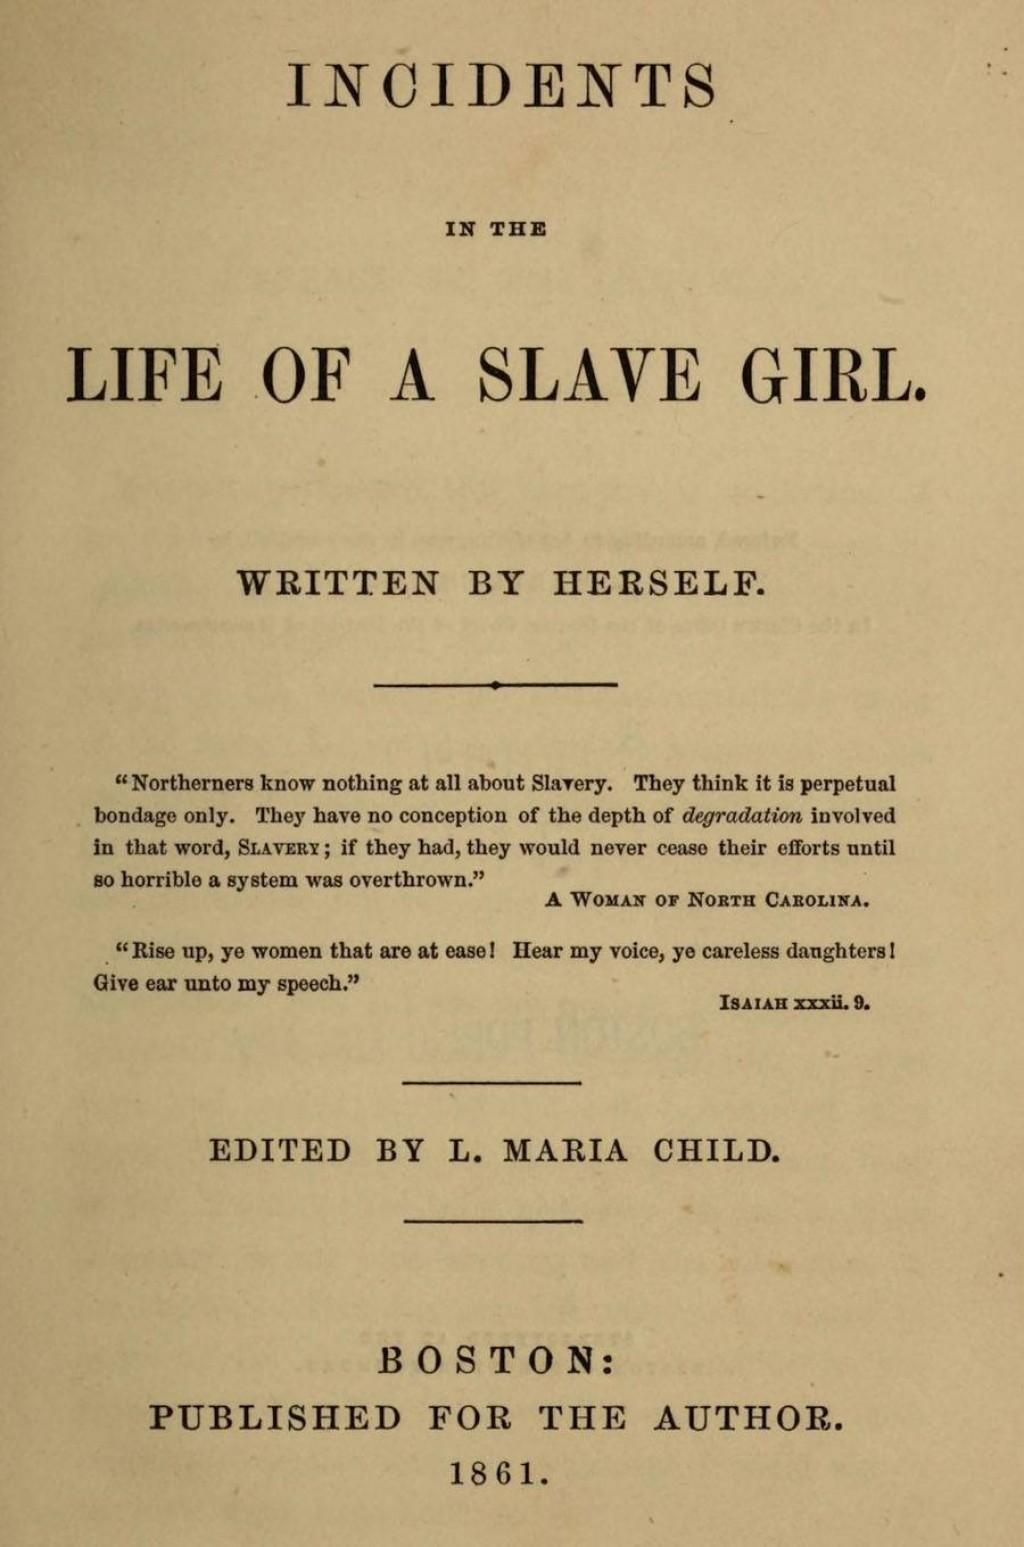 001 Harriet Jacobs Essay Example Black History Remarkable Vs Frederick Douglass Topics Analysis Large